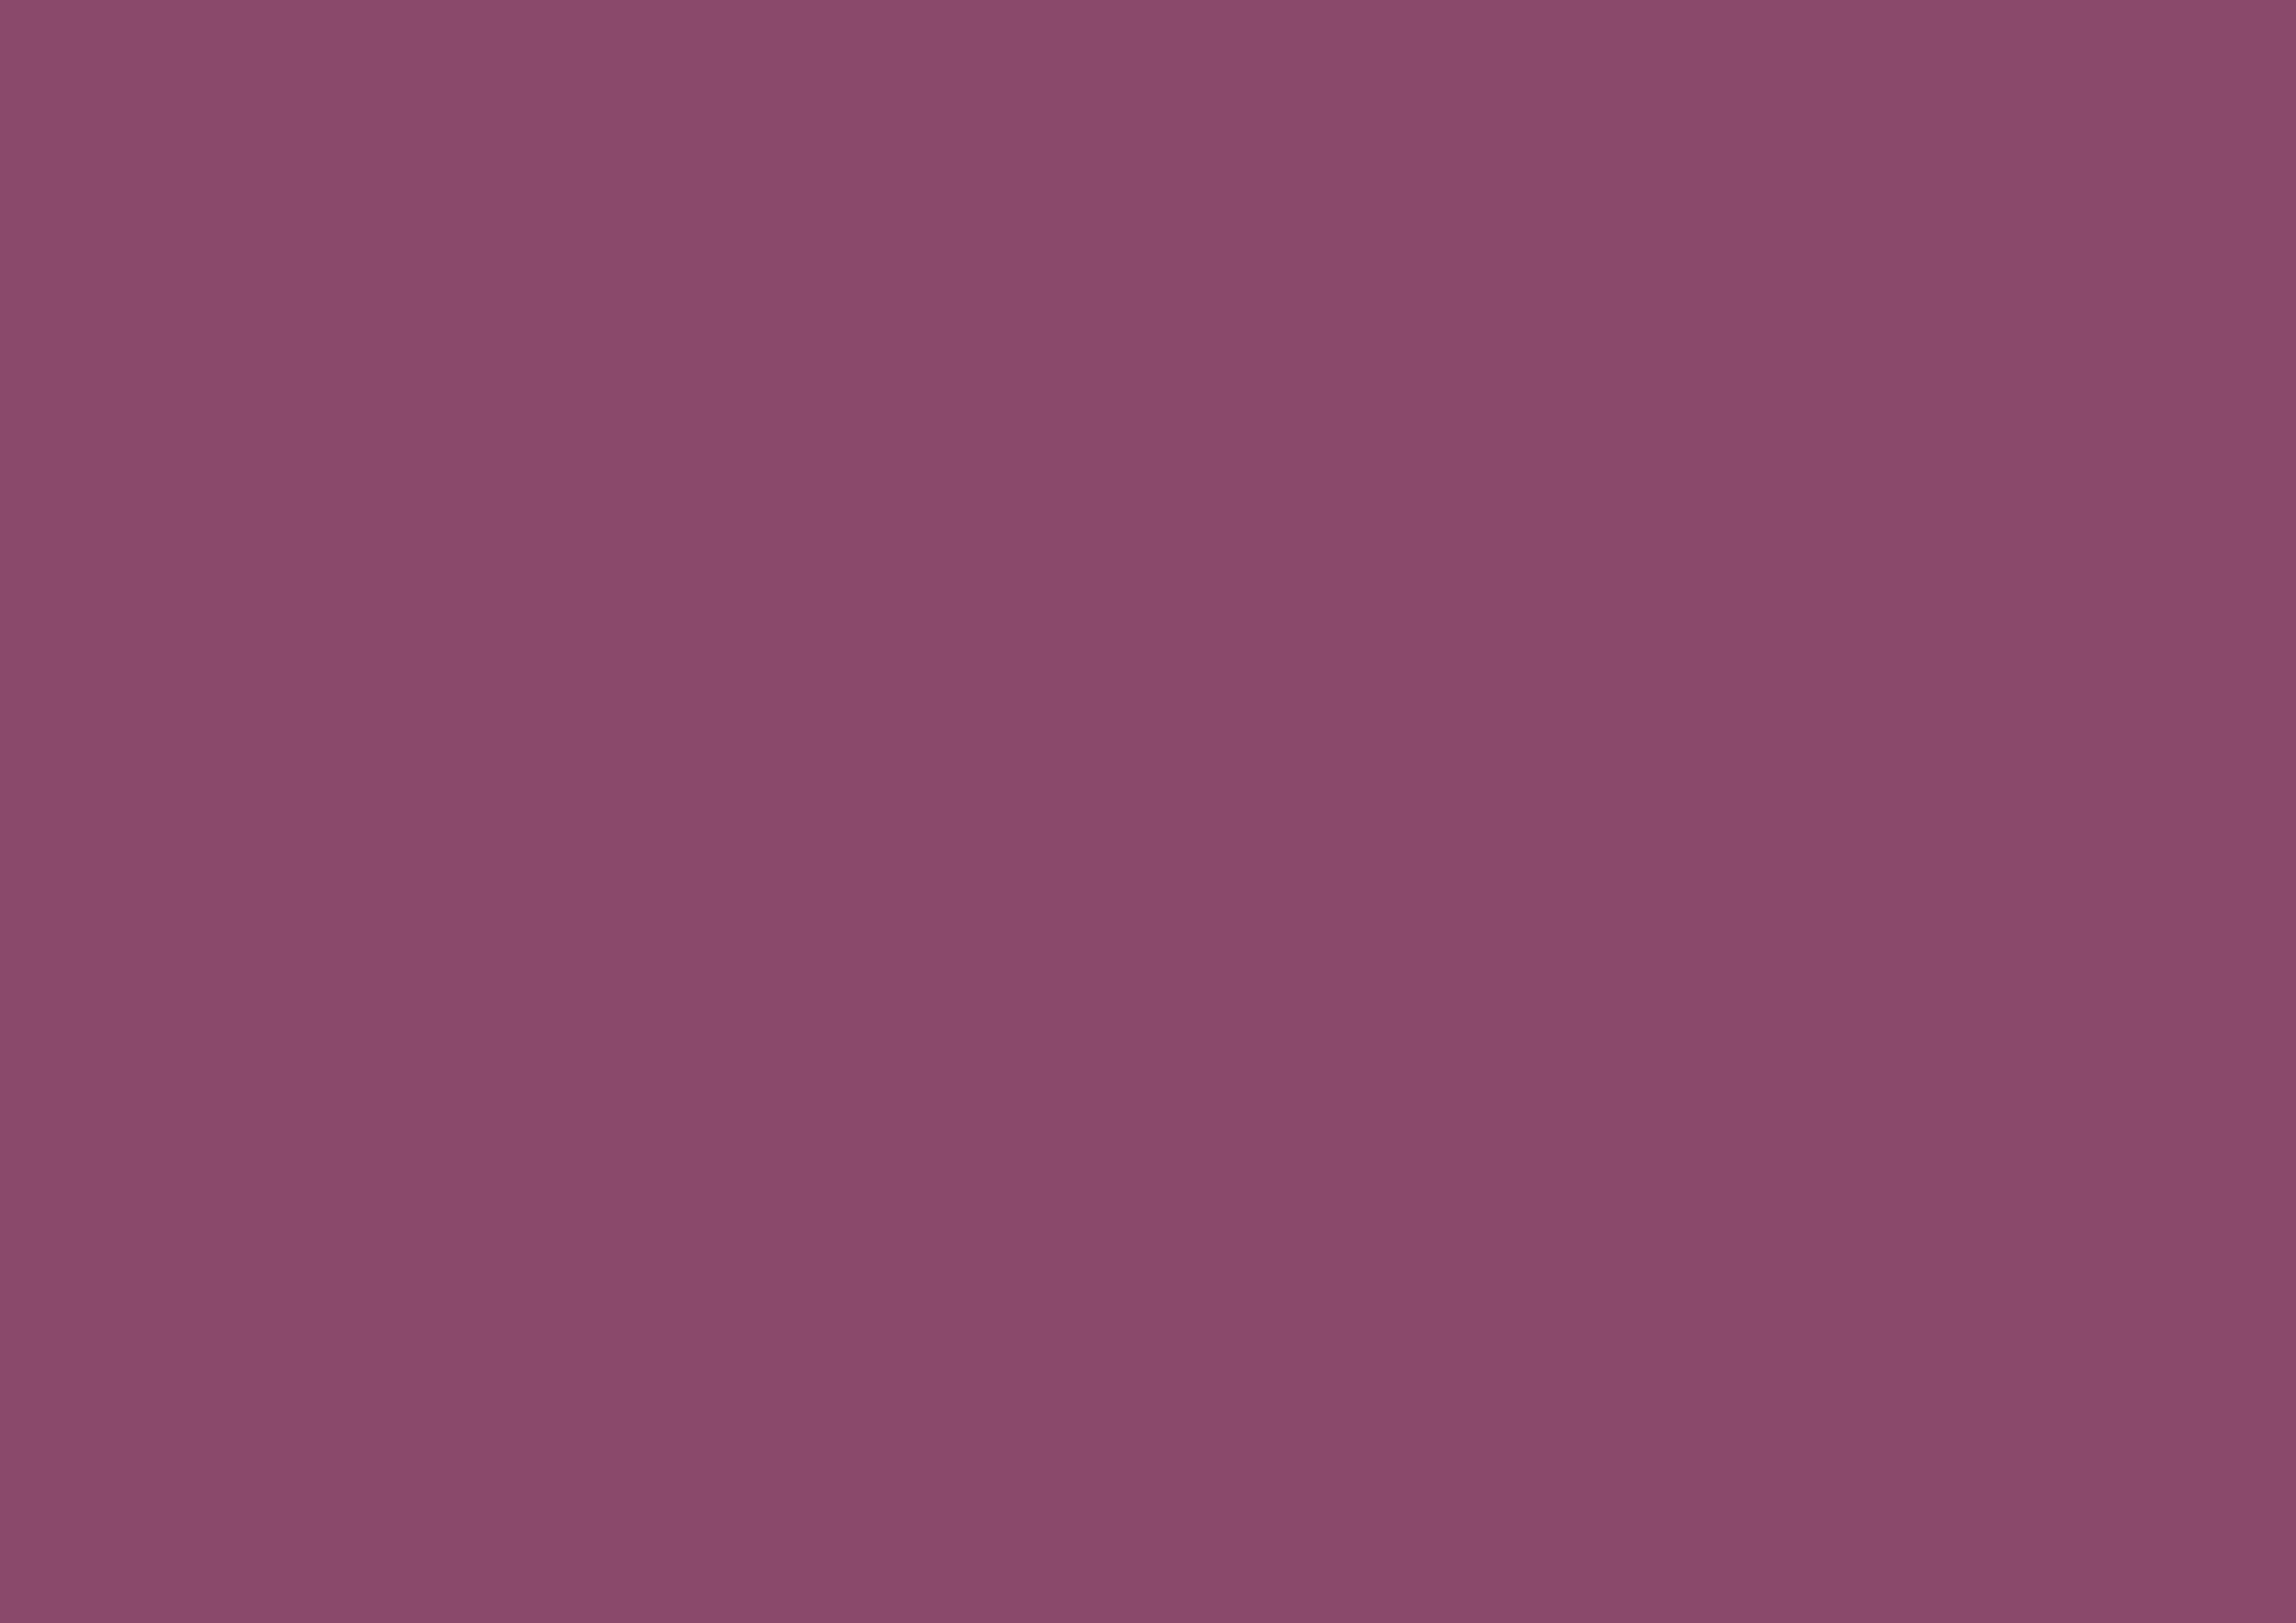 3508x2480 Twilight Lavender Solid Color Background